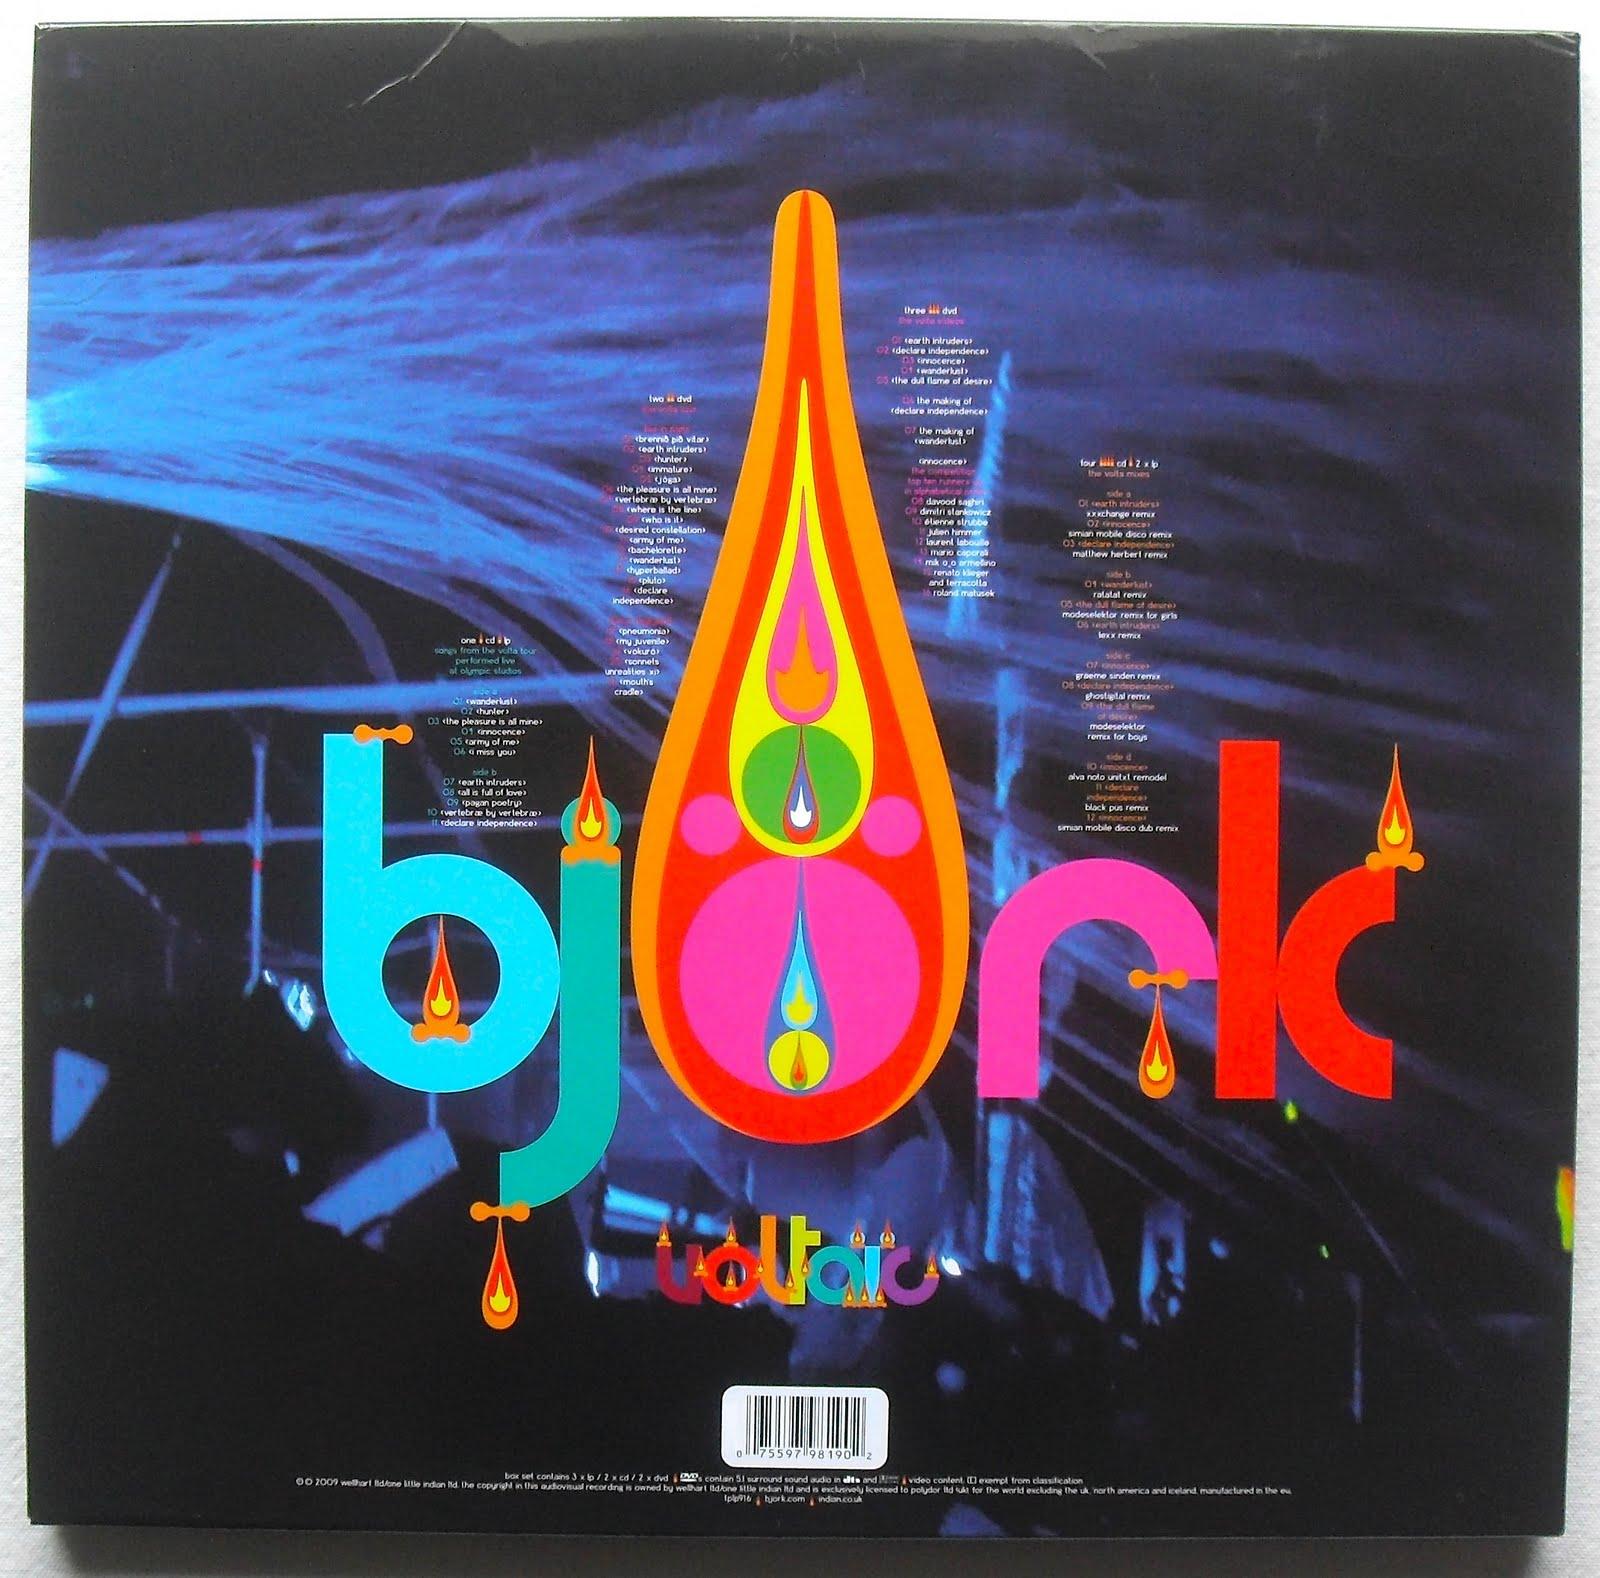 http://4.bp.blogspot.com/-QYRjFXvb_60/TgNX2_p3IjI/AAAAAAAAEjk/ugjHirJRPYM/s1600/BJORK+Voltaic+2009+LImited+Edition+Double+Vinyl+DVD+CD+Box+Set+LP+Record+Album+I.JPG